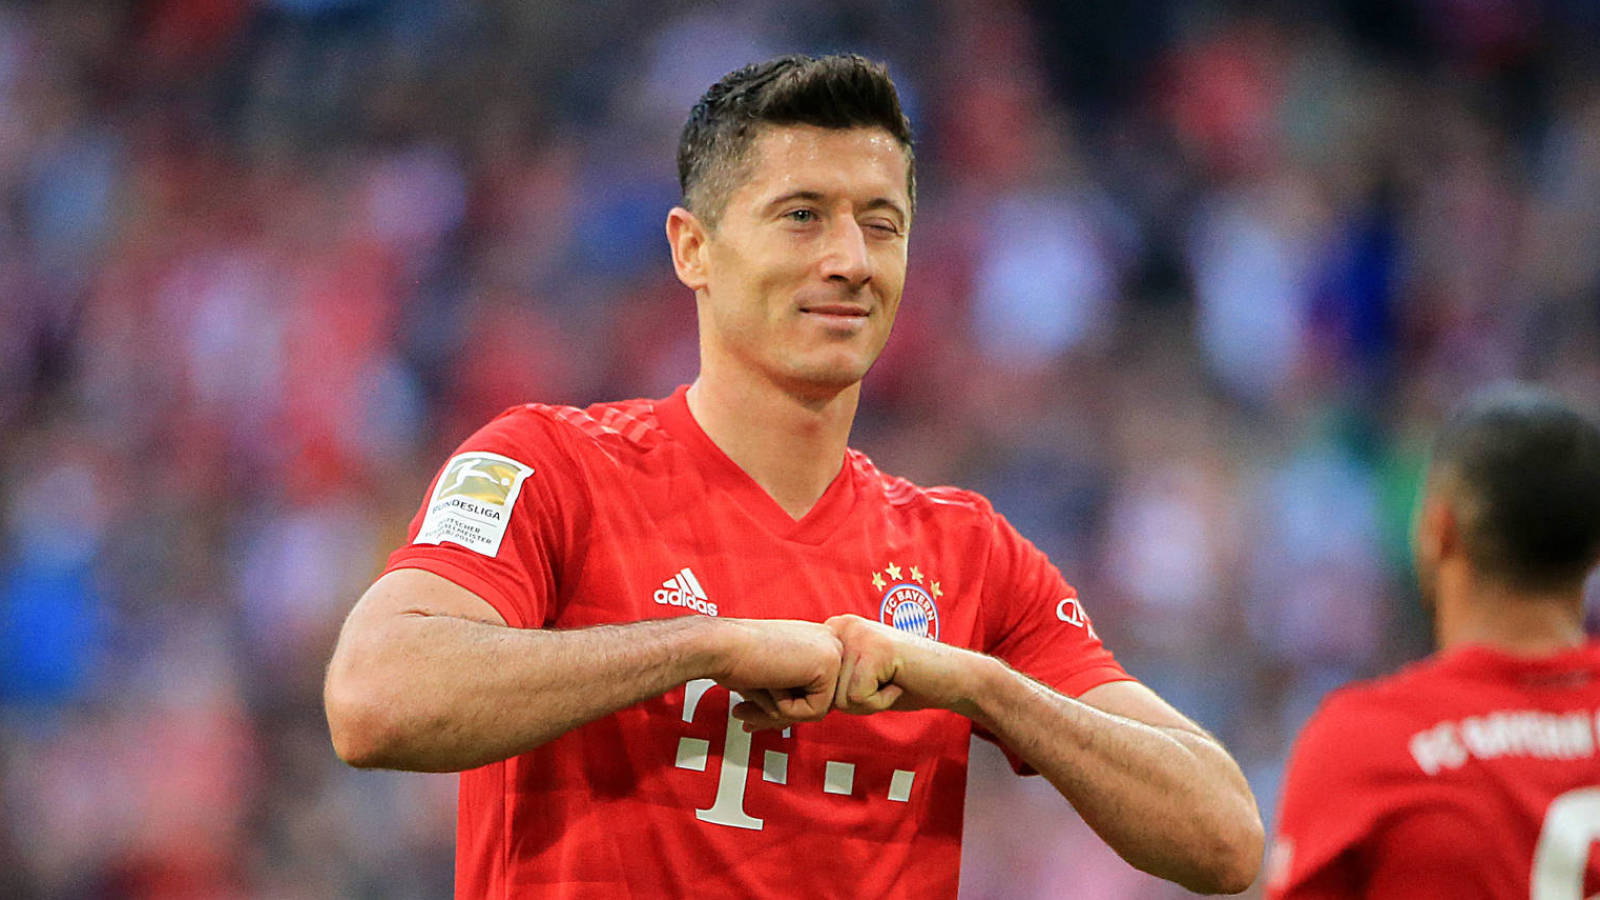 The Ballon D'Or & aging strikers: Robert Lewandowski accepts his place